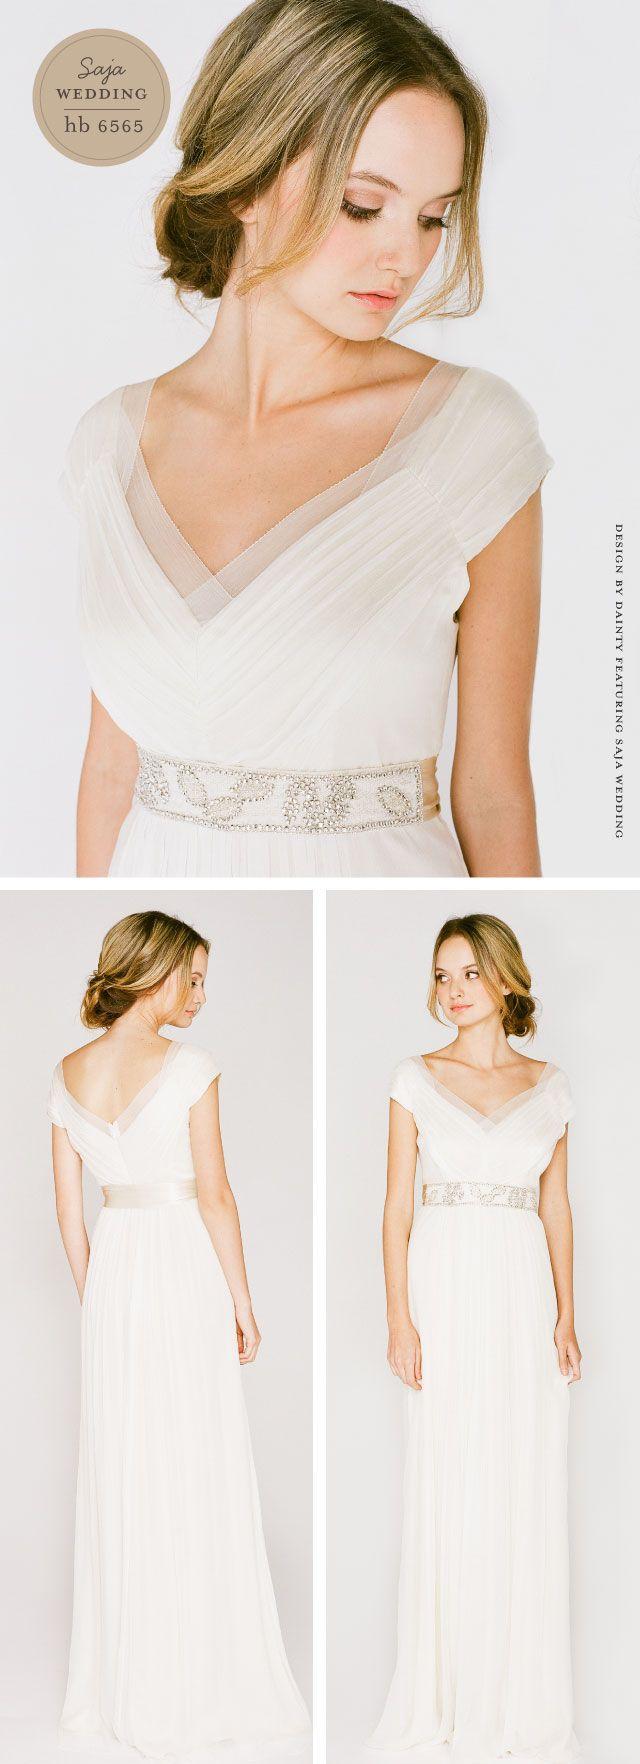 Sajaweddingsg pixeles wedding dresses pinterest